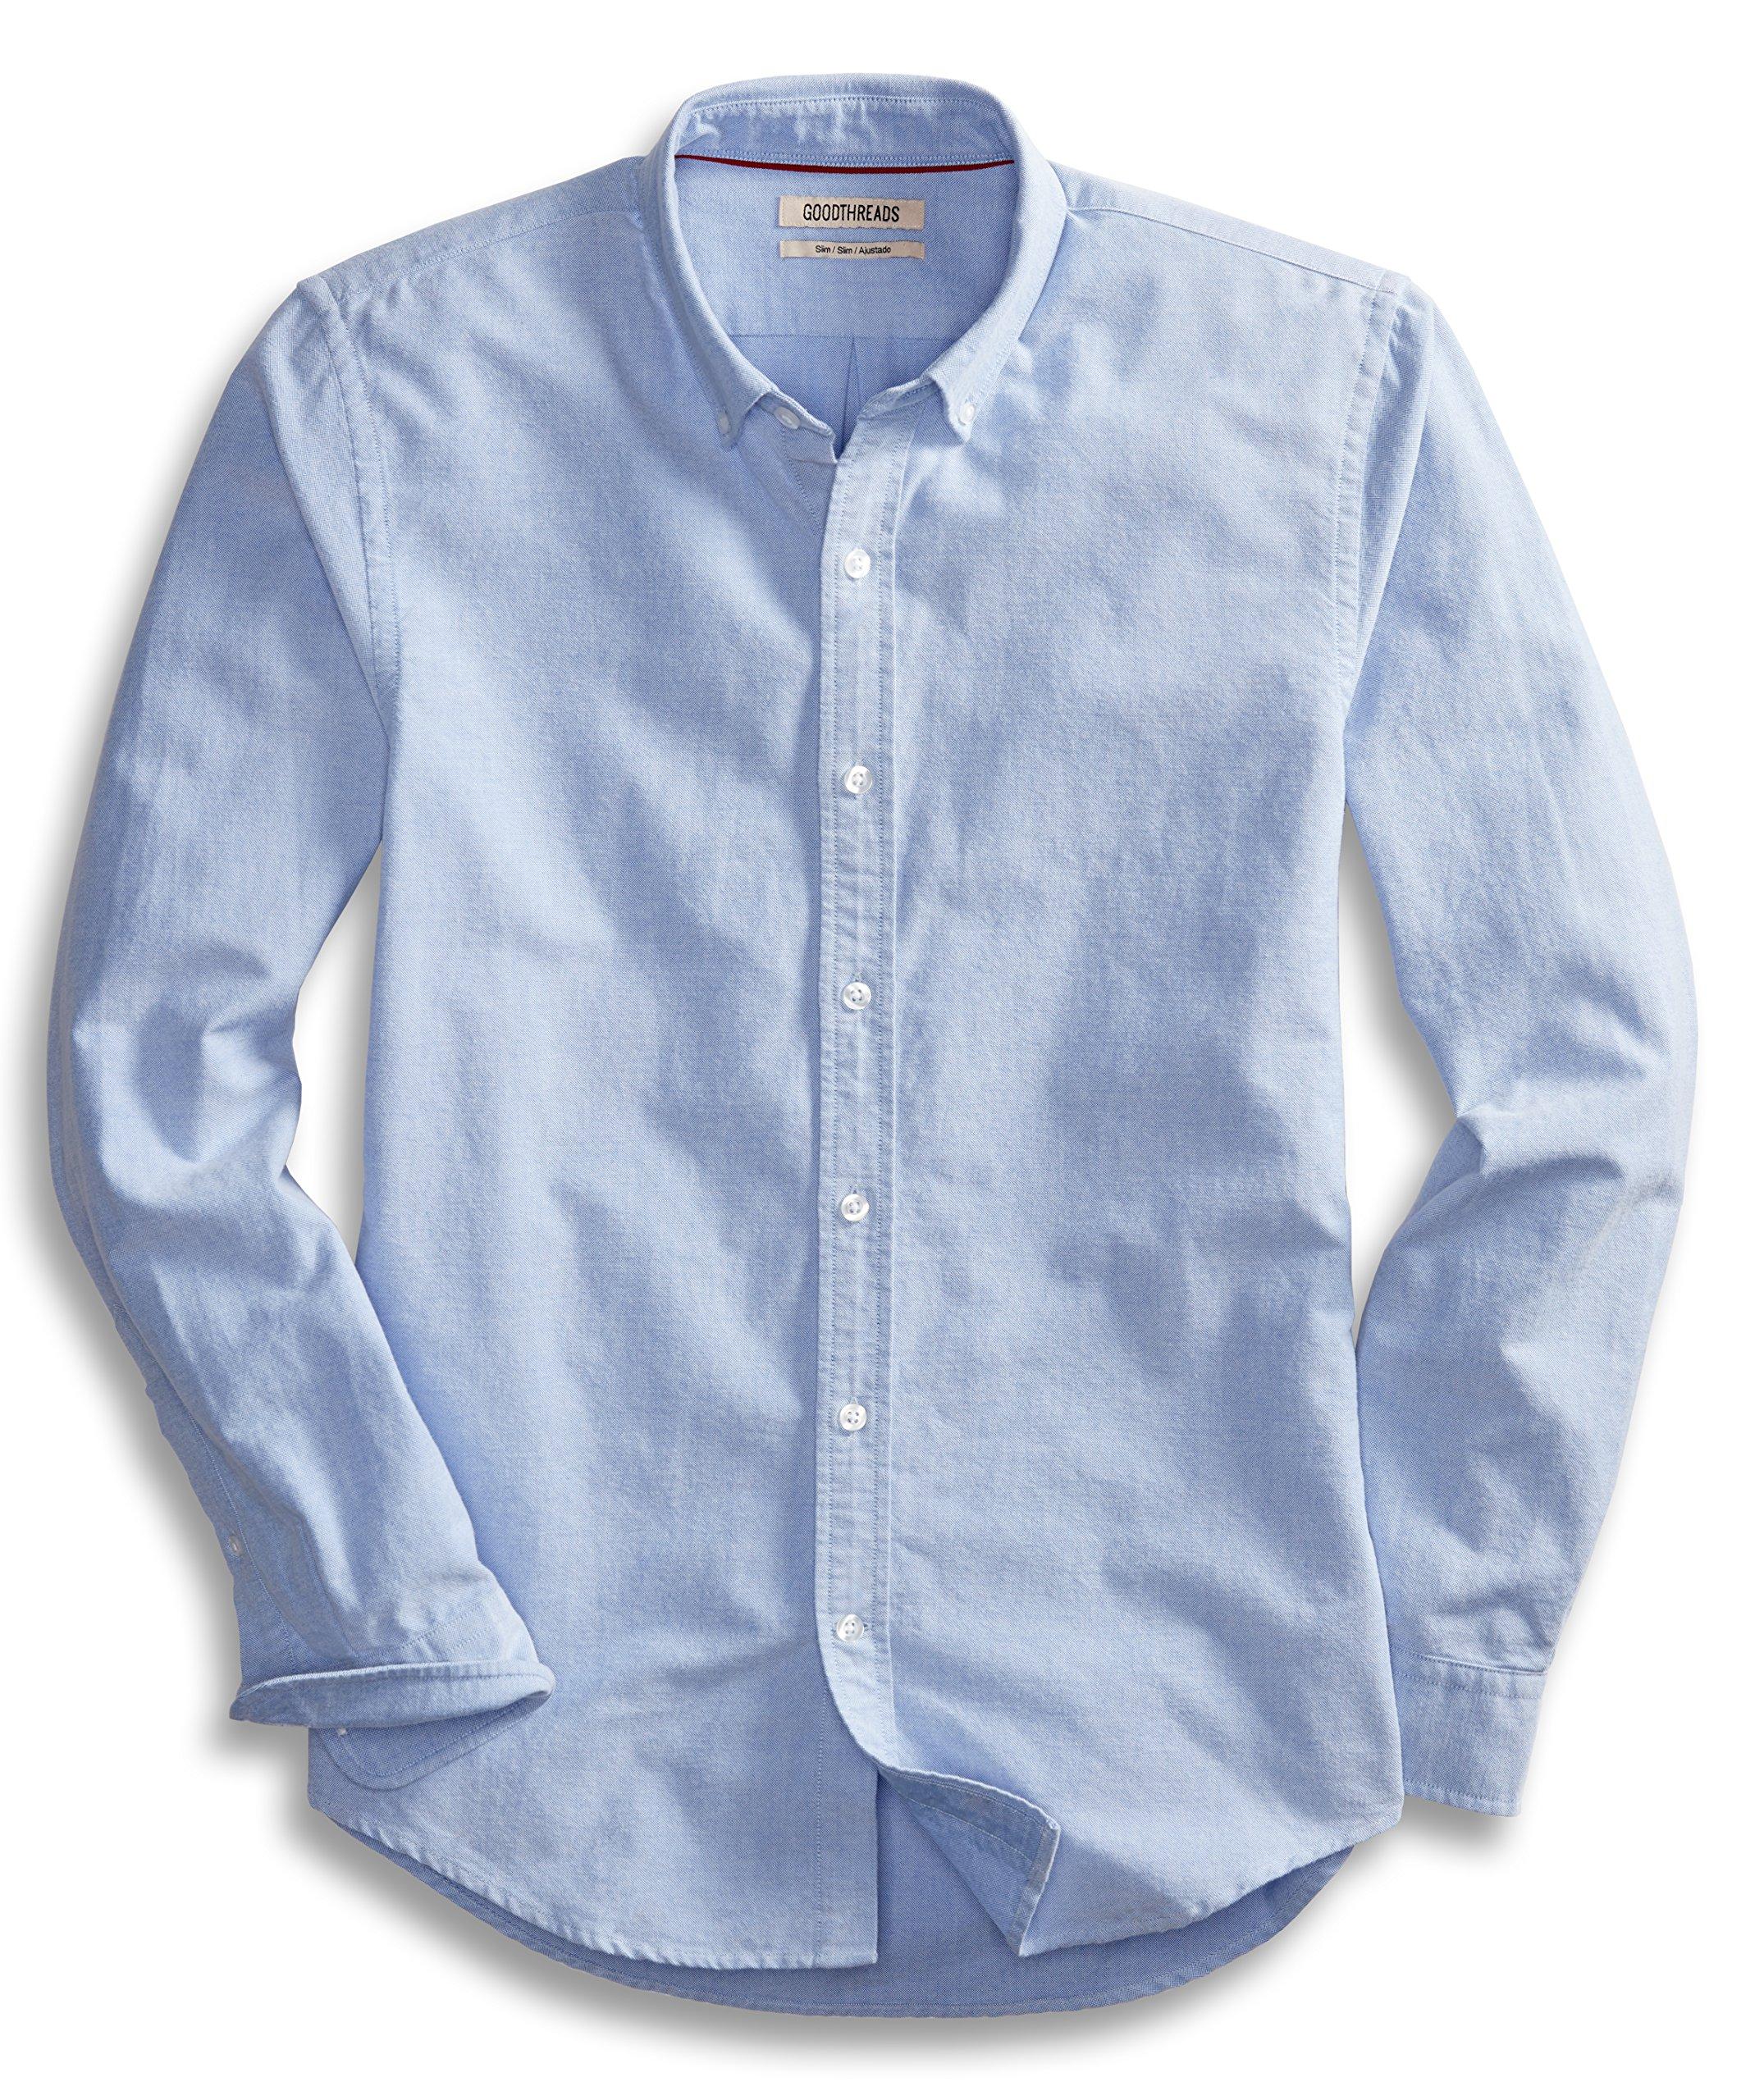 Goodthreads Men's Slim-Fit Long-Sleeve Solid Oxford Shirt, Blue, Medium by Goodthreads